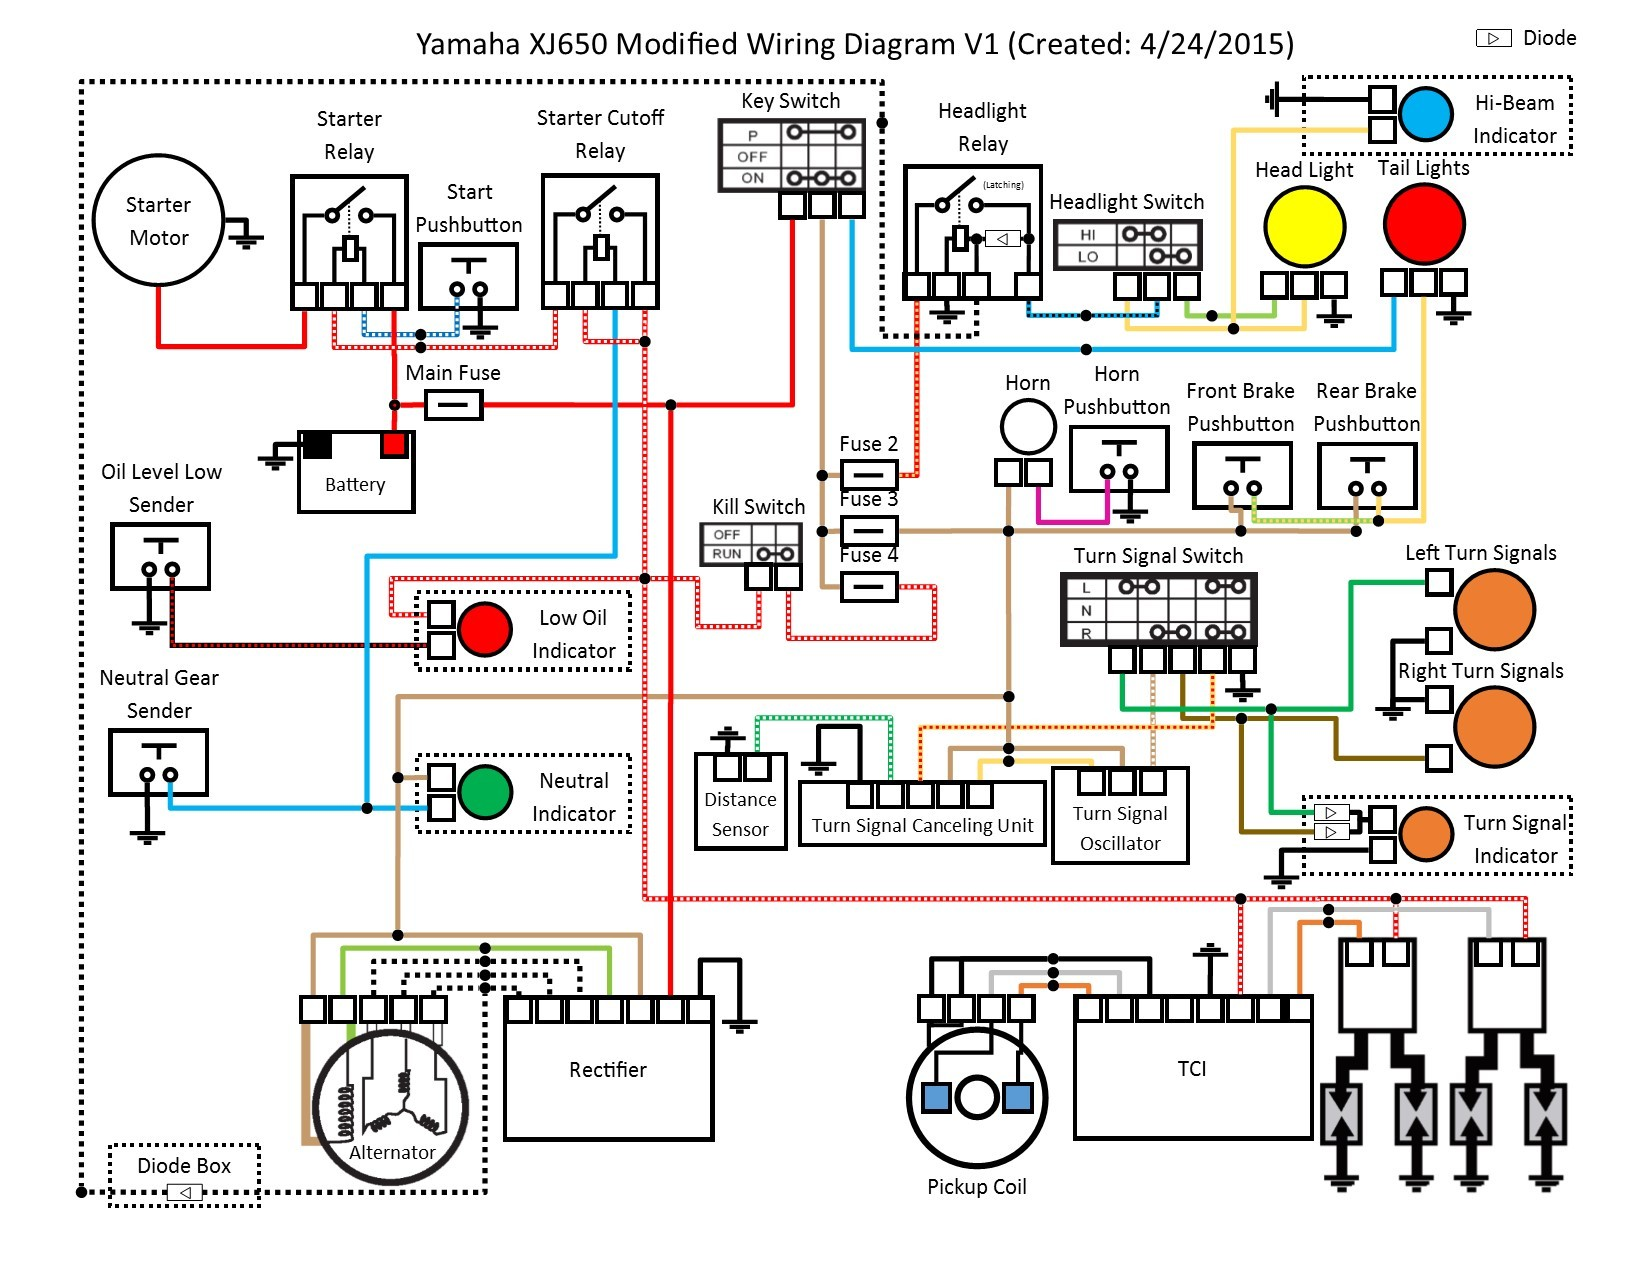 Motorcycle Electrical Diagram Yamaha 650 Maxim Wiring Diagram View Diagram Wiring Diagrams Wiring Of Motorcycle Electrical Diagram